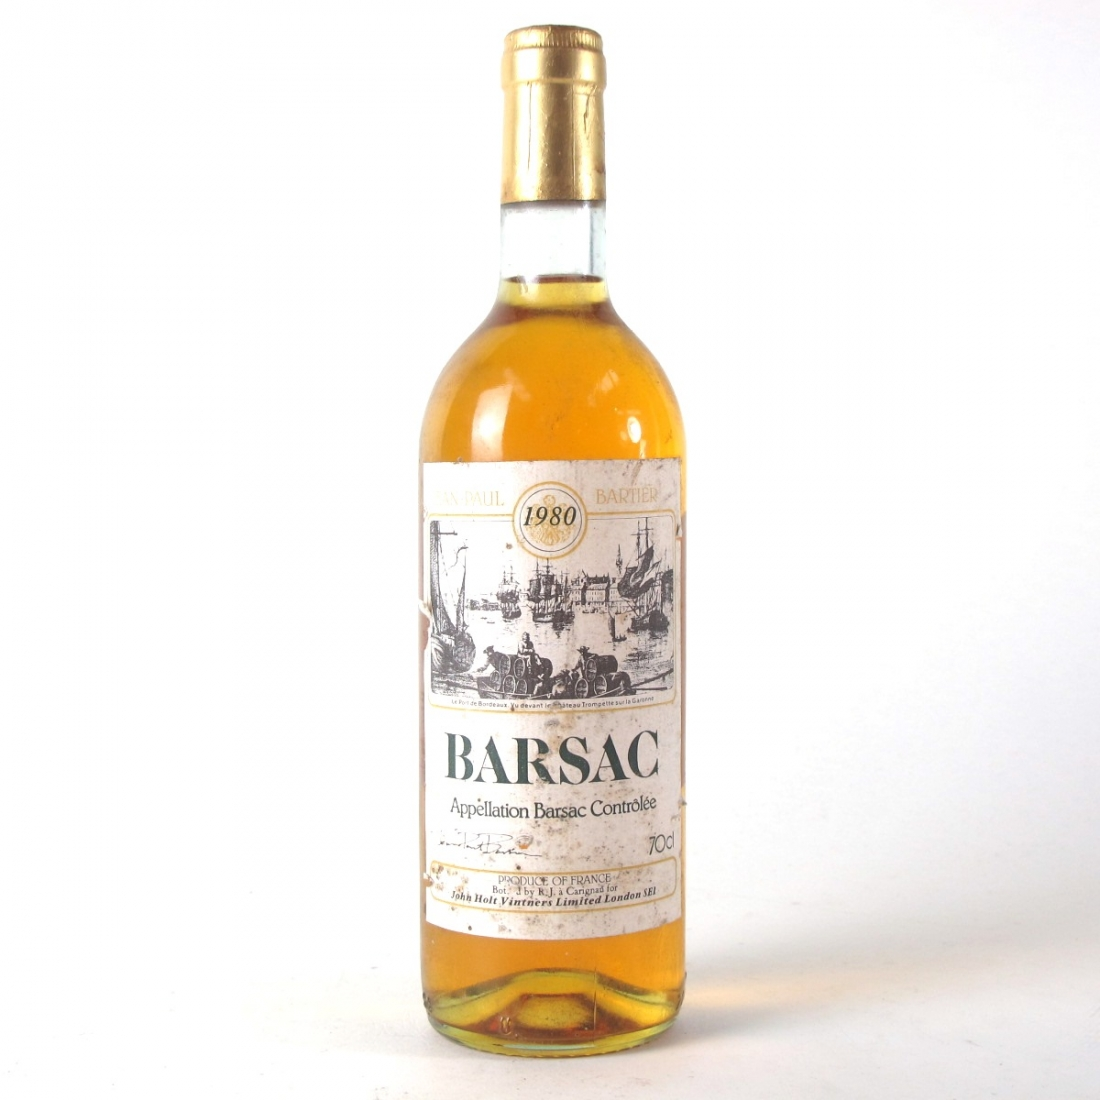 J.P.Bartier 1980 Barsac